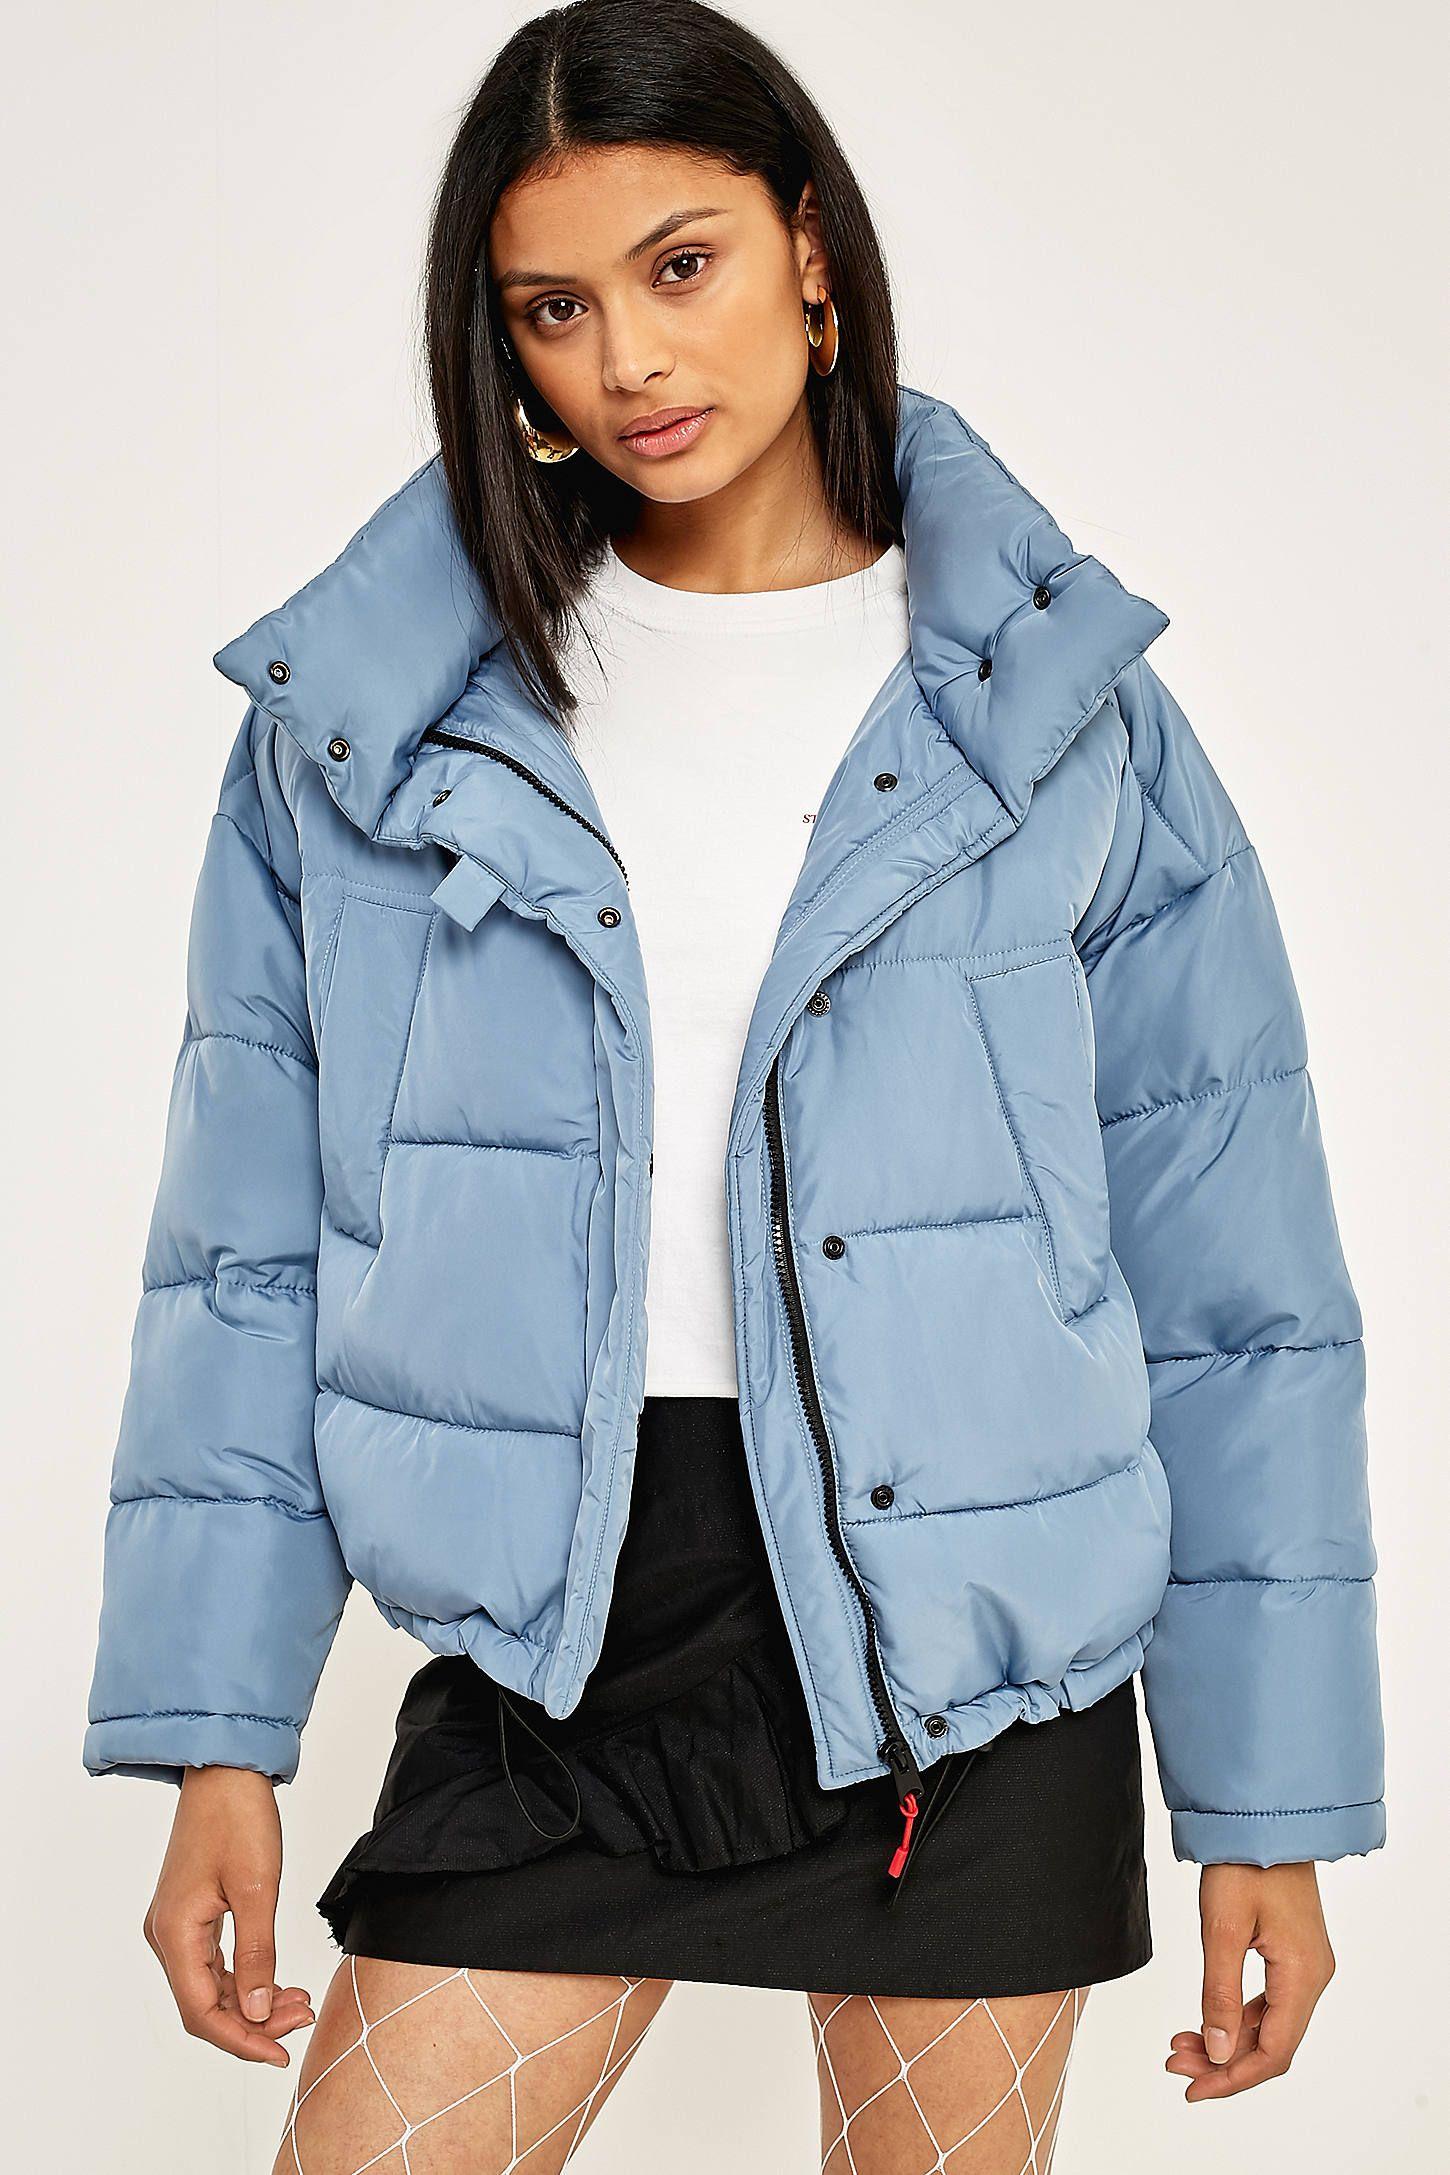 4b5798139 Shop Light Before Dark Blue Pillow Puffer Jacket at Urban Outfitters ...